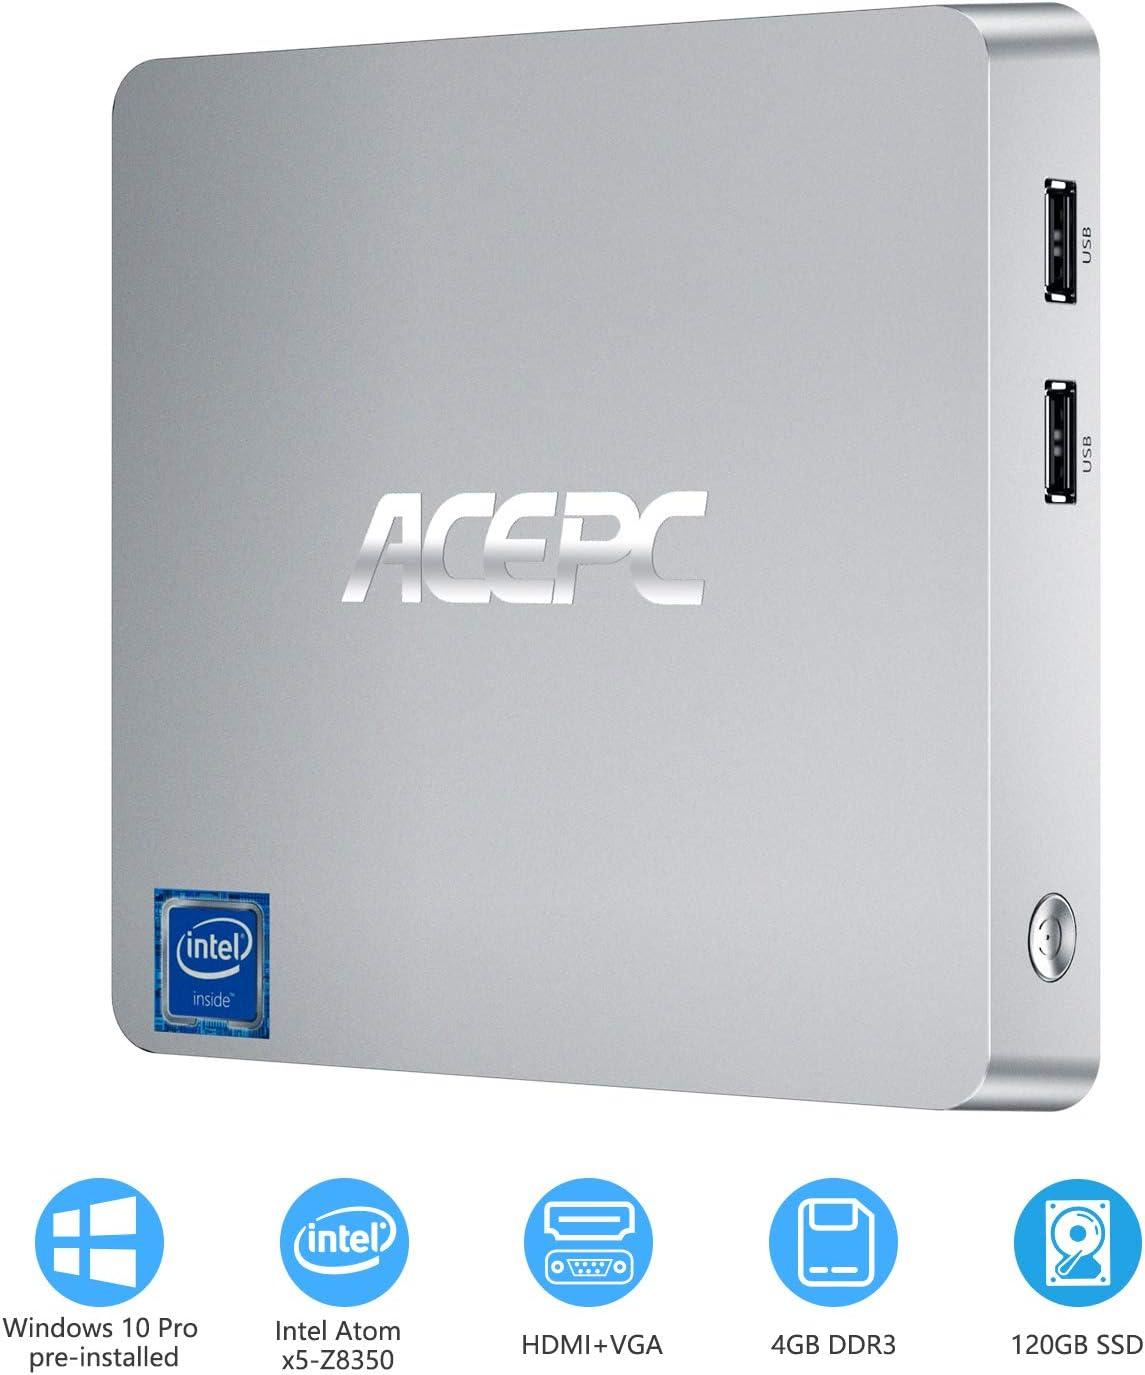 Mini PC, T11 Intel Atom Z8350 Windows 10 Pro Mini Computer 4GB DDR/64GB eMMC/120GB 2.5-Inch SATA III Internal SSD,Support 4K HD,HDMI+VGA Output,2.4G/5G WiFi,Bluetooth,1000Mbps Ethernet